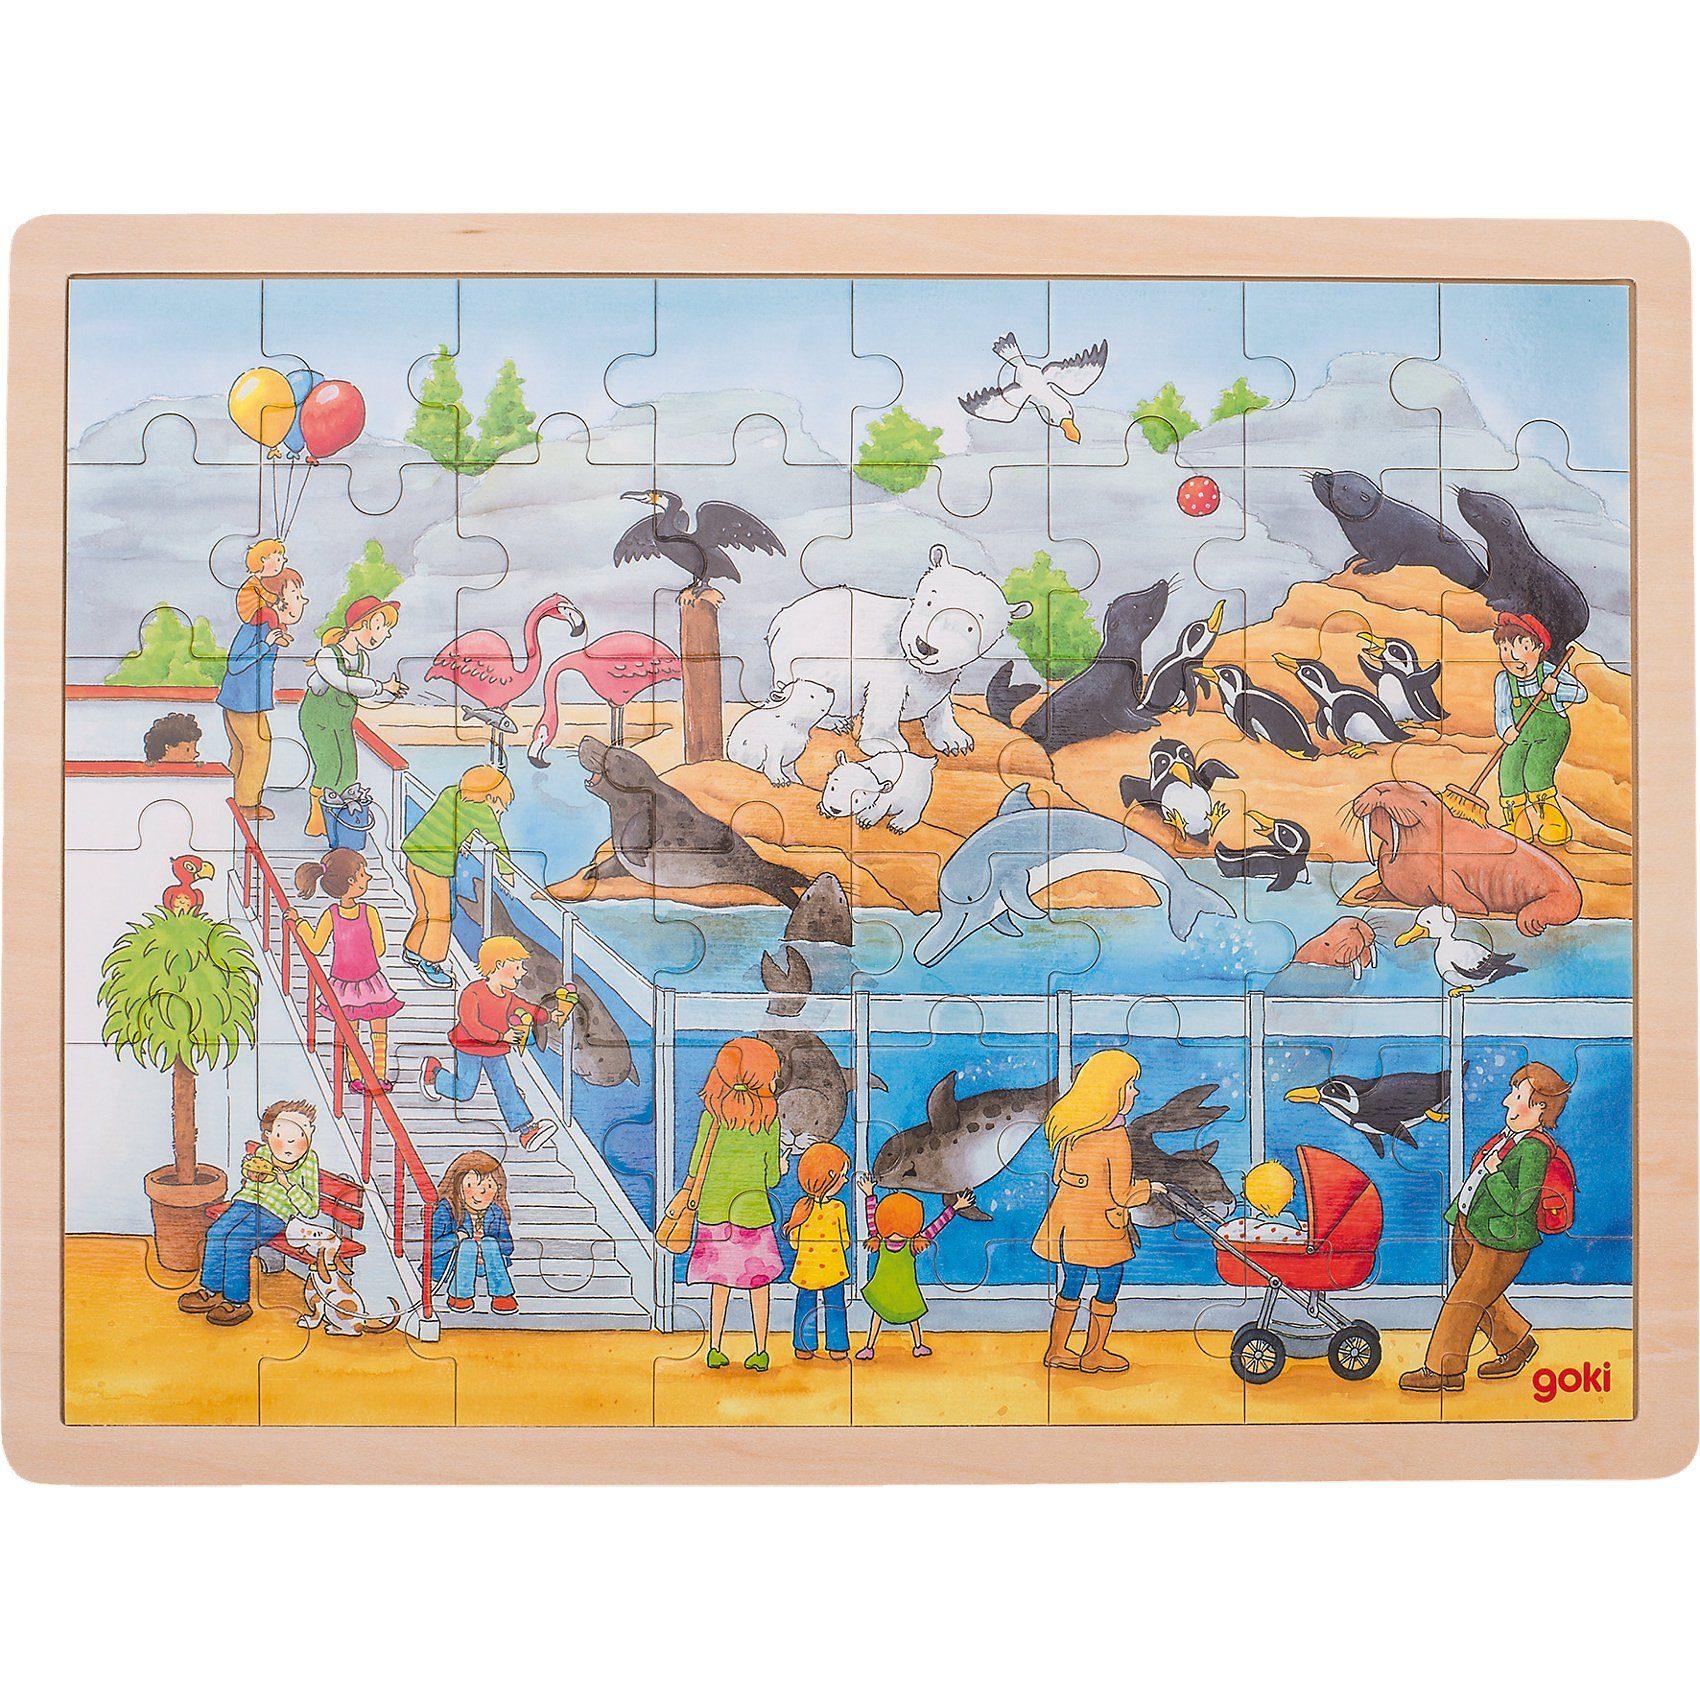 goki Holzpuzzle 48 Teile Ausflug in den Zoo